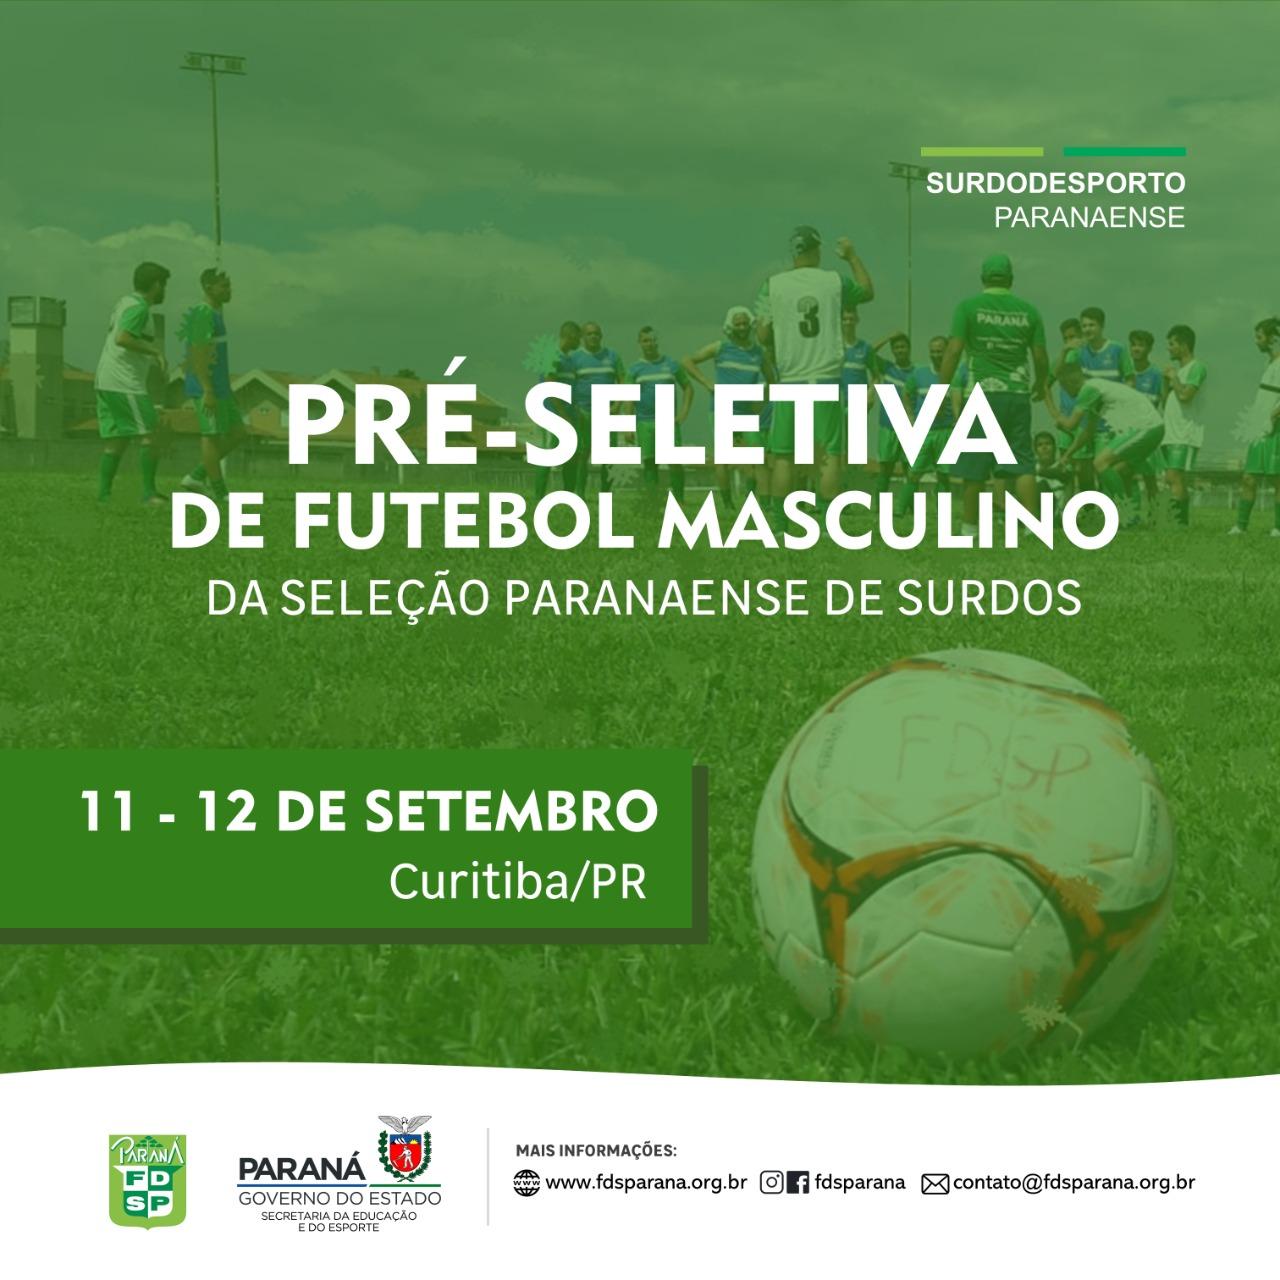 pre-seletiva-futebol-FDSP